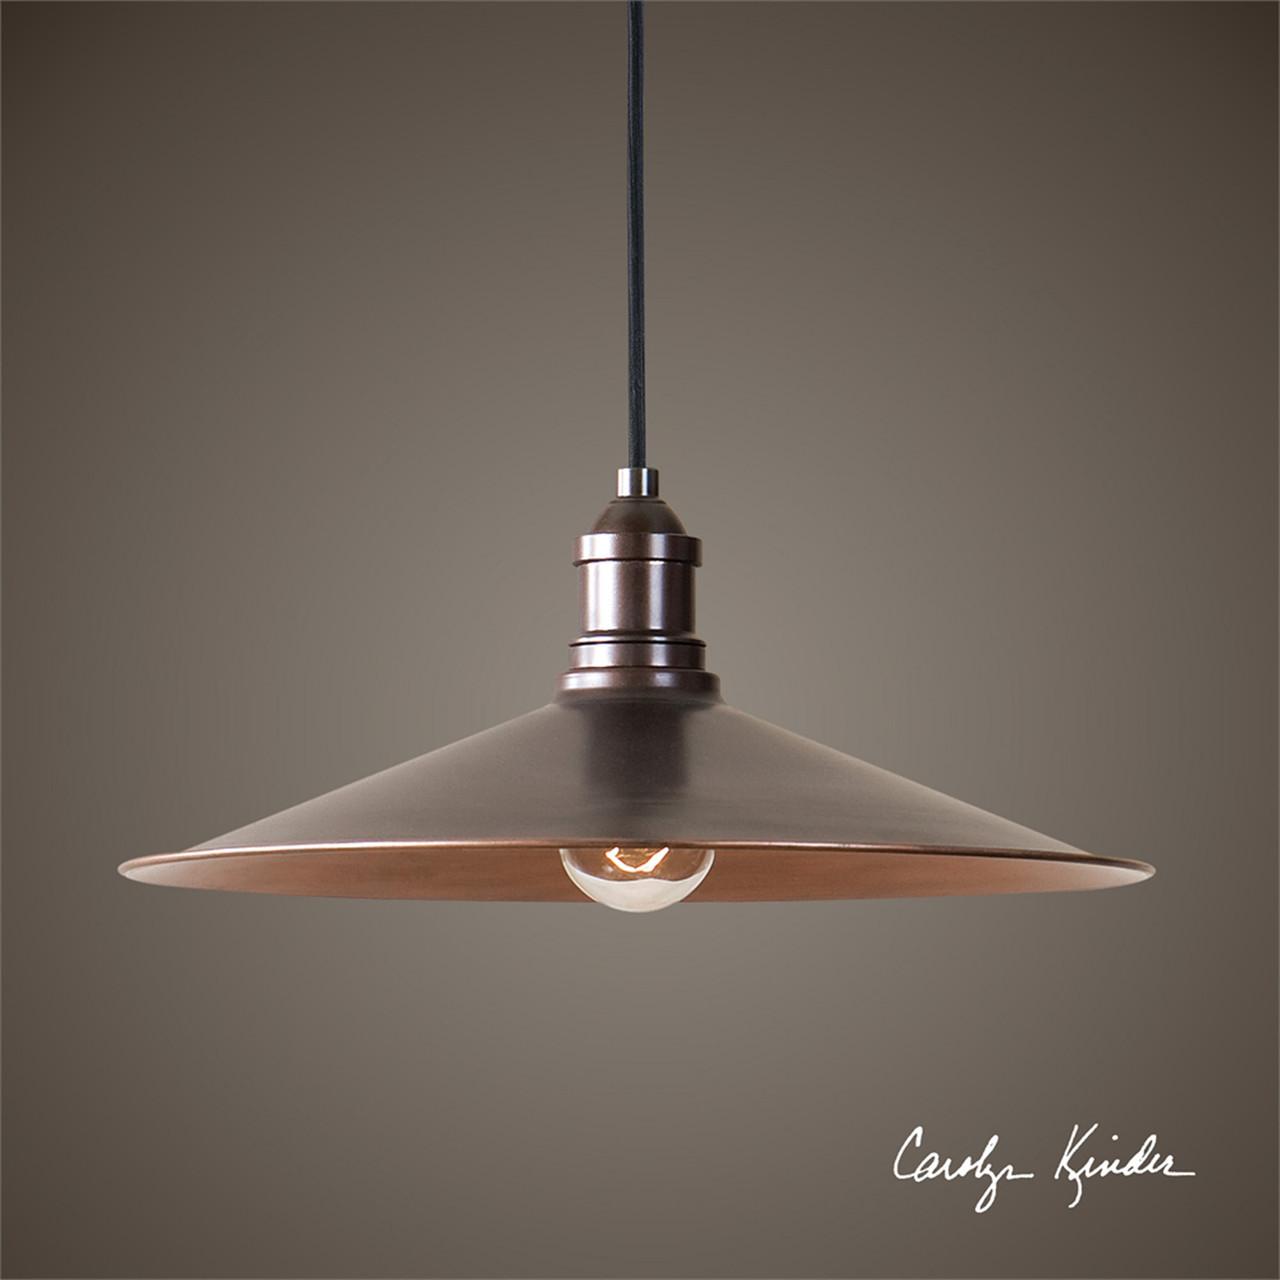 14 Yn Kinder Barnstead 1 Bulb Antique Copper Pendant Ceiling Light Fixture 31494856